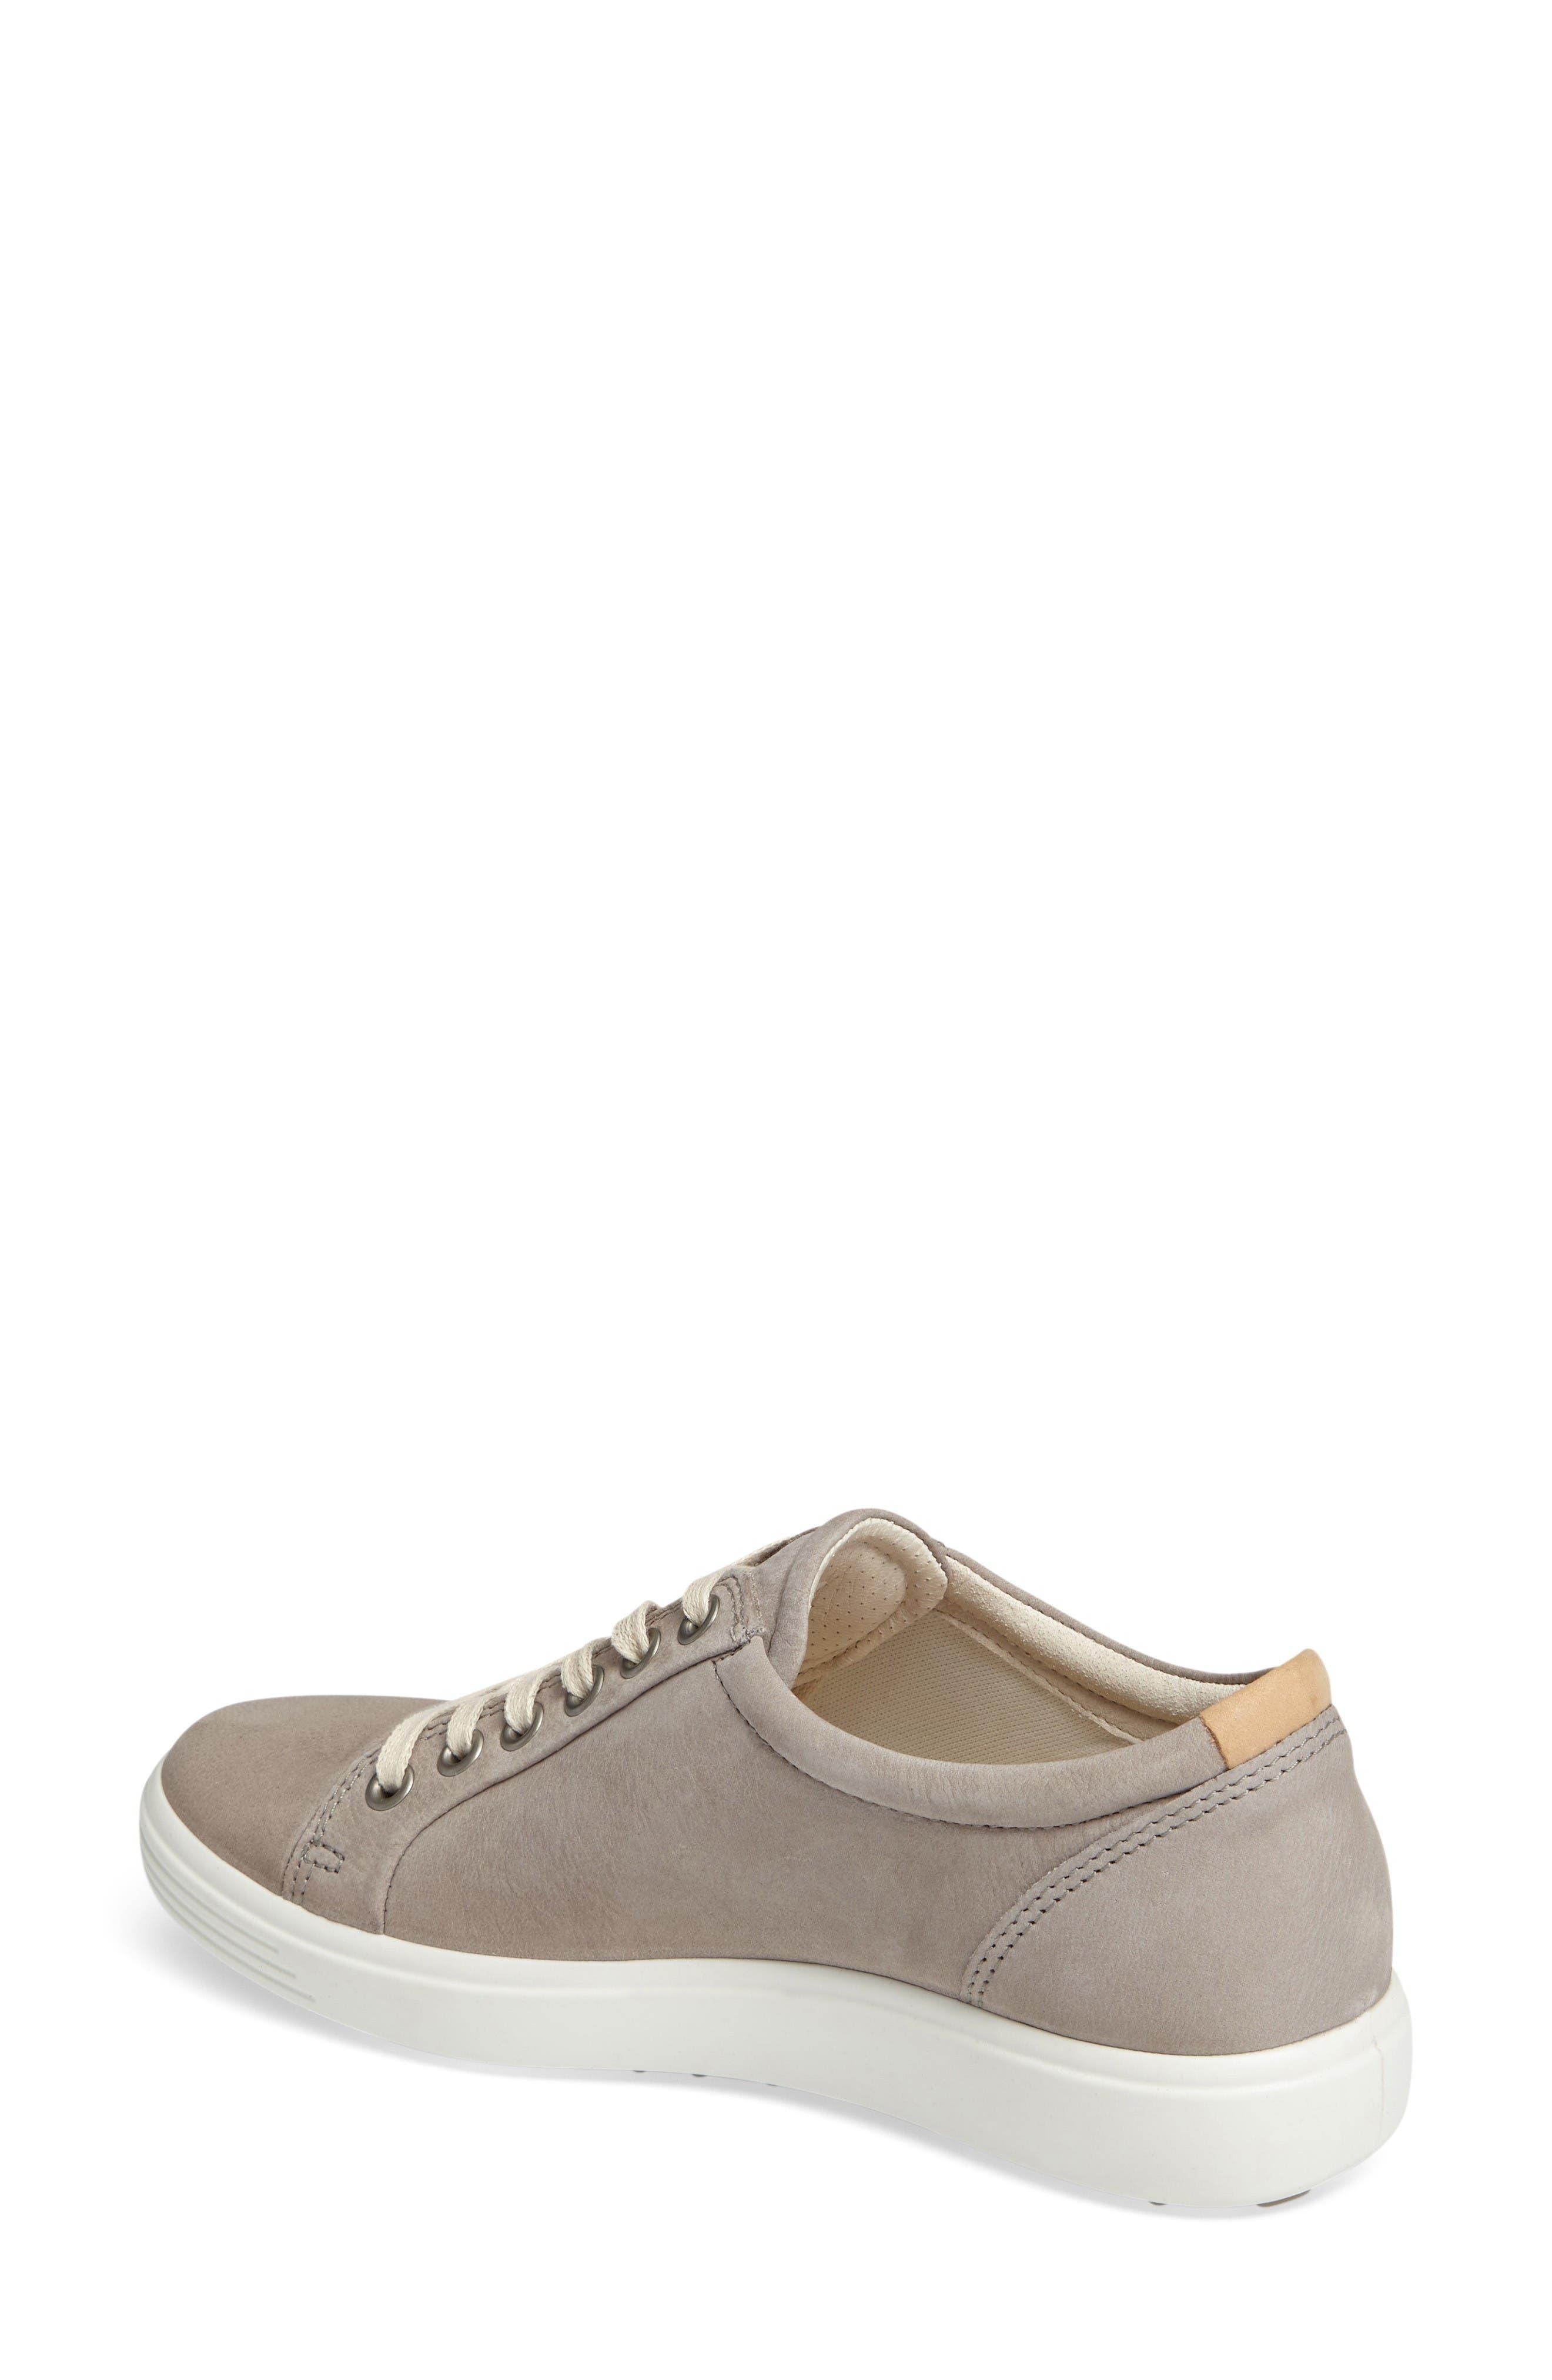 Alternate Image 2  - ECCO 'Soft 7' Cap Toe Sneaker (Women)